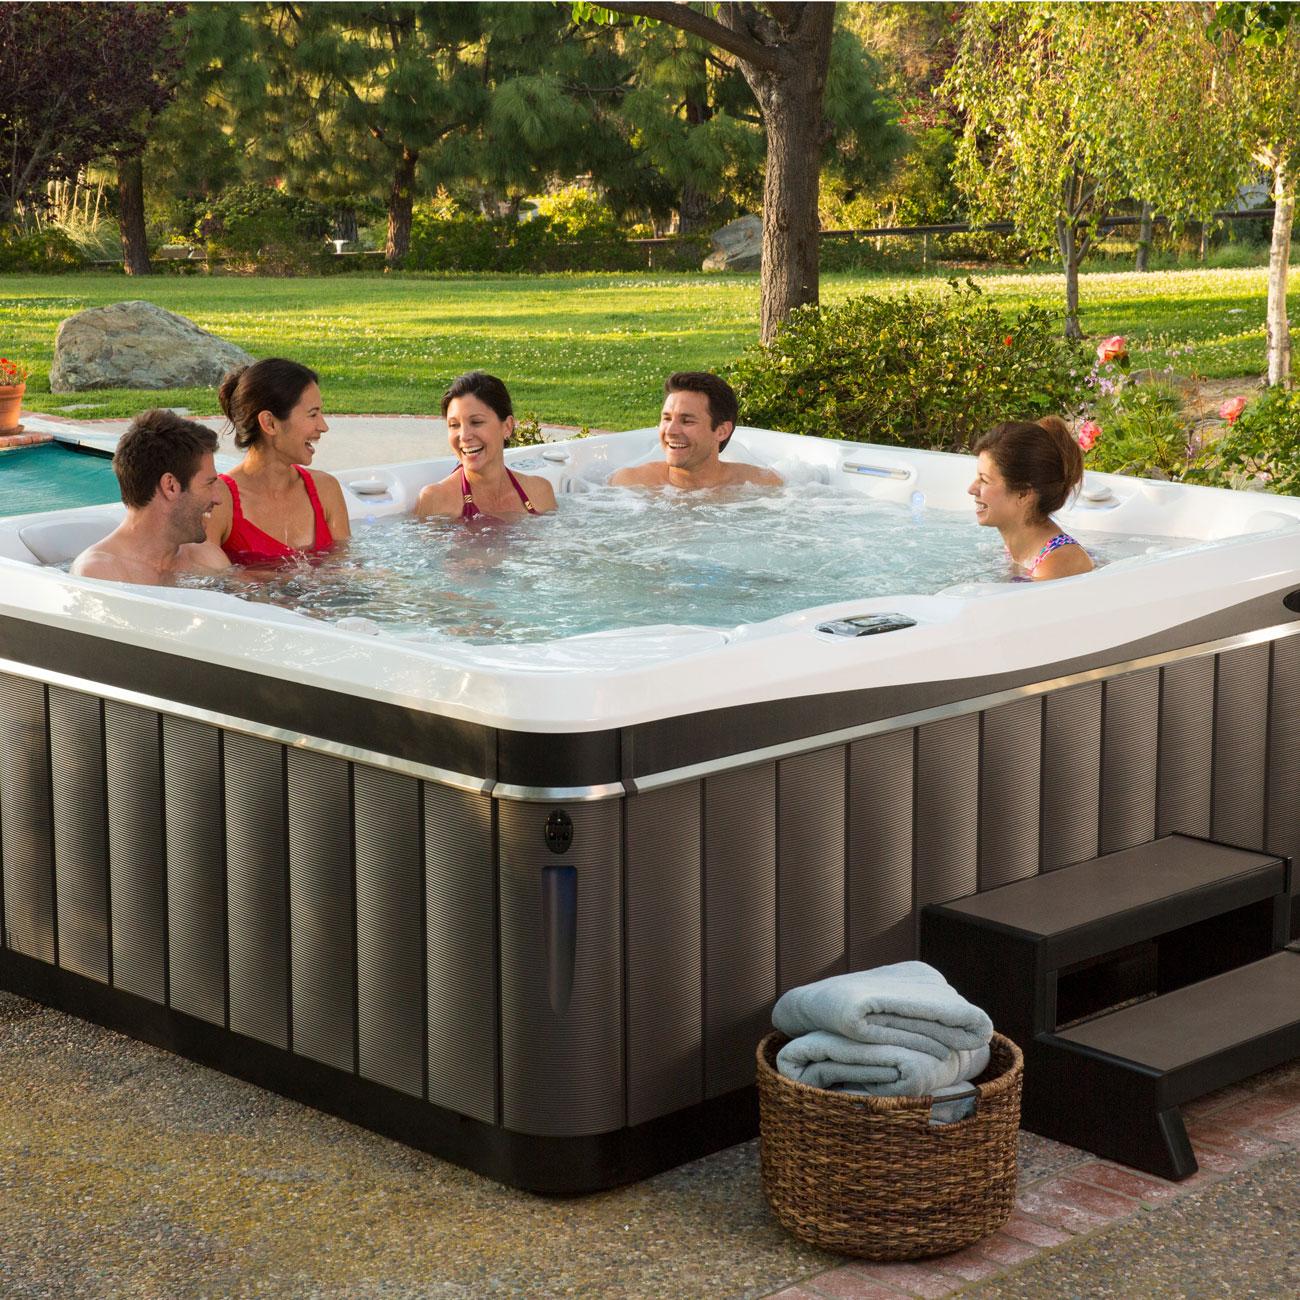 caldera spa cantabria model 8 person luxury outdoor living. Black Bedroom Furniture Sets. Home Design Ideas